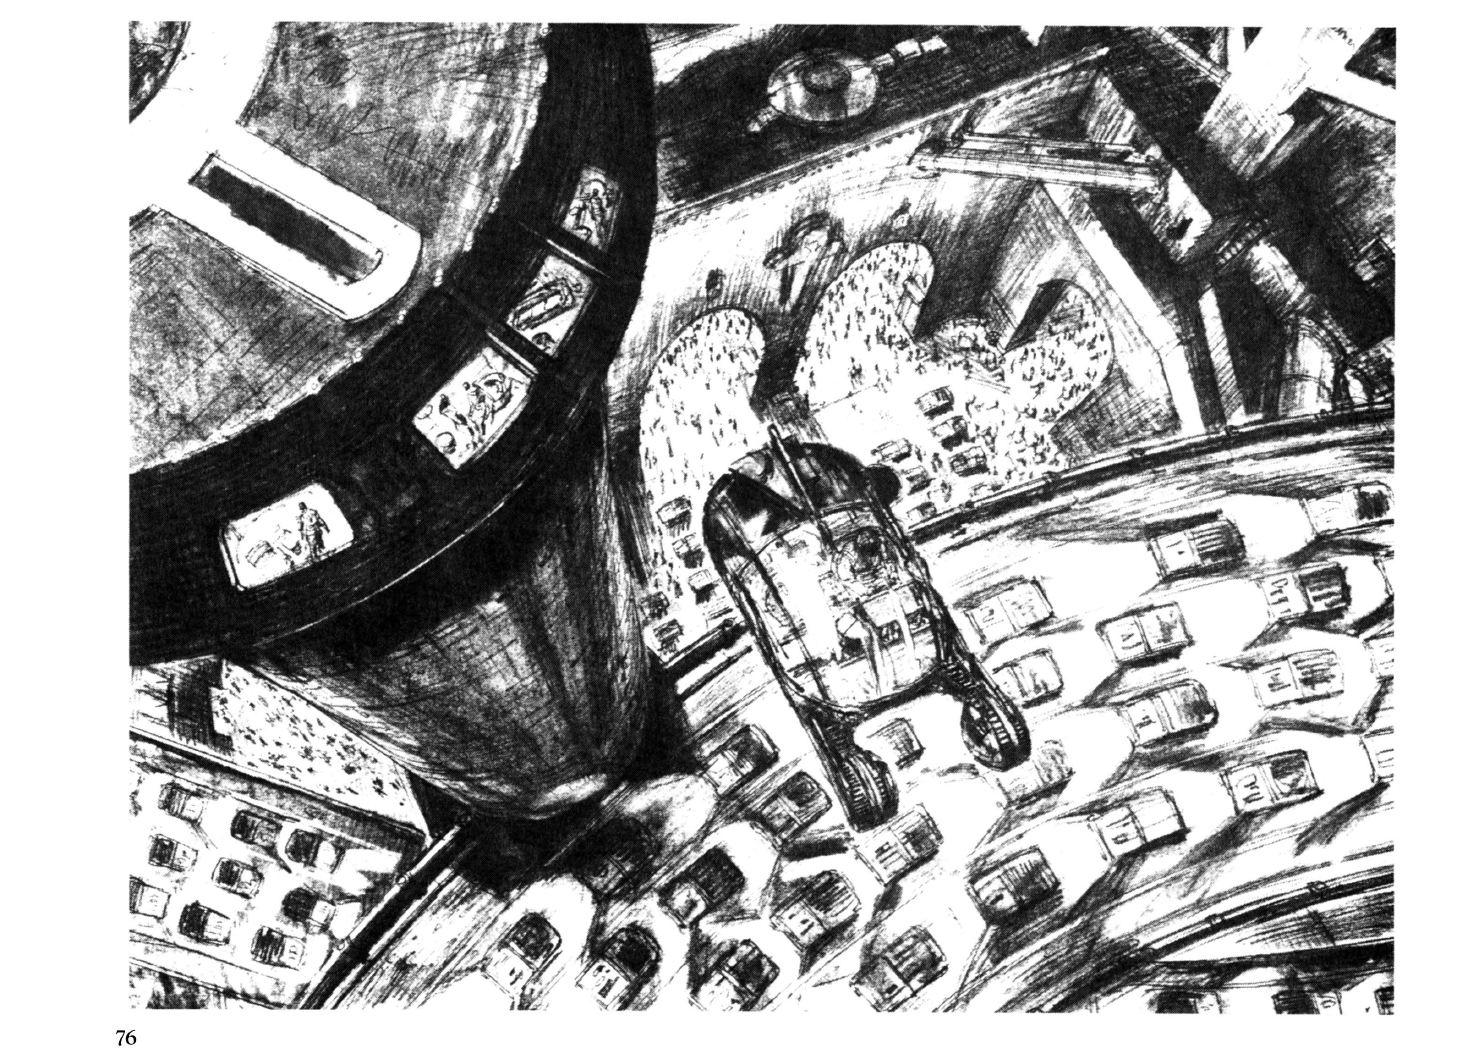 """Blade Runner sketchbook"", Blue Dolphin Enterprises, 1982"